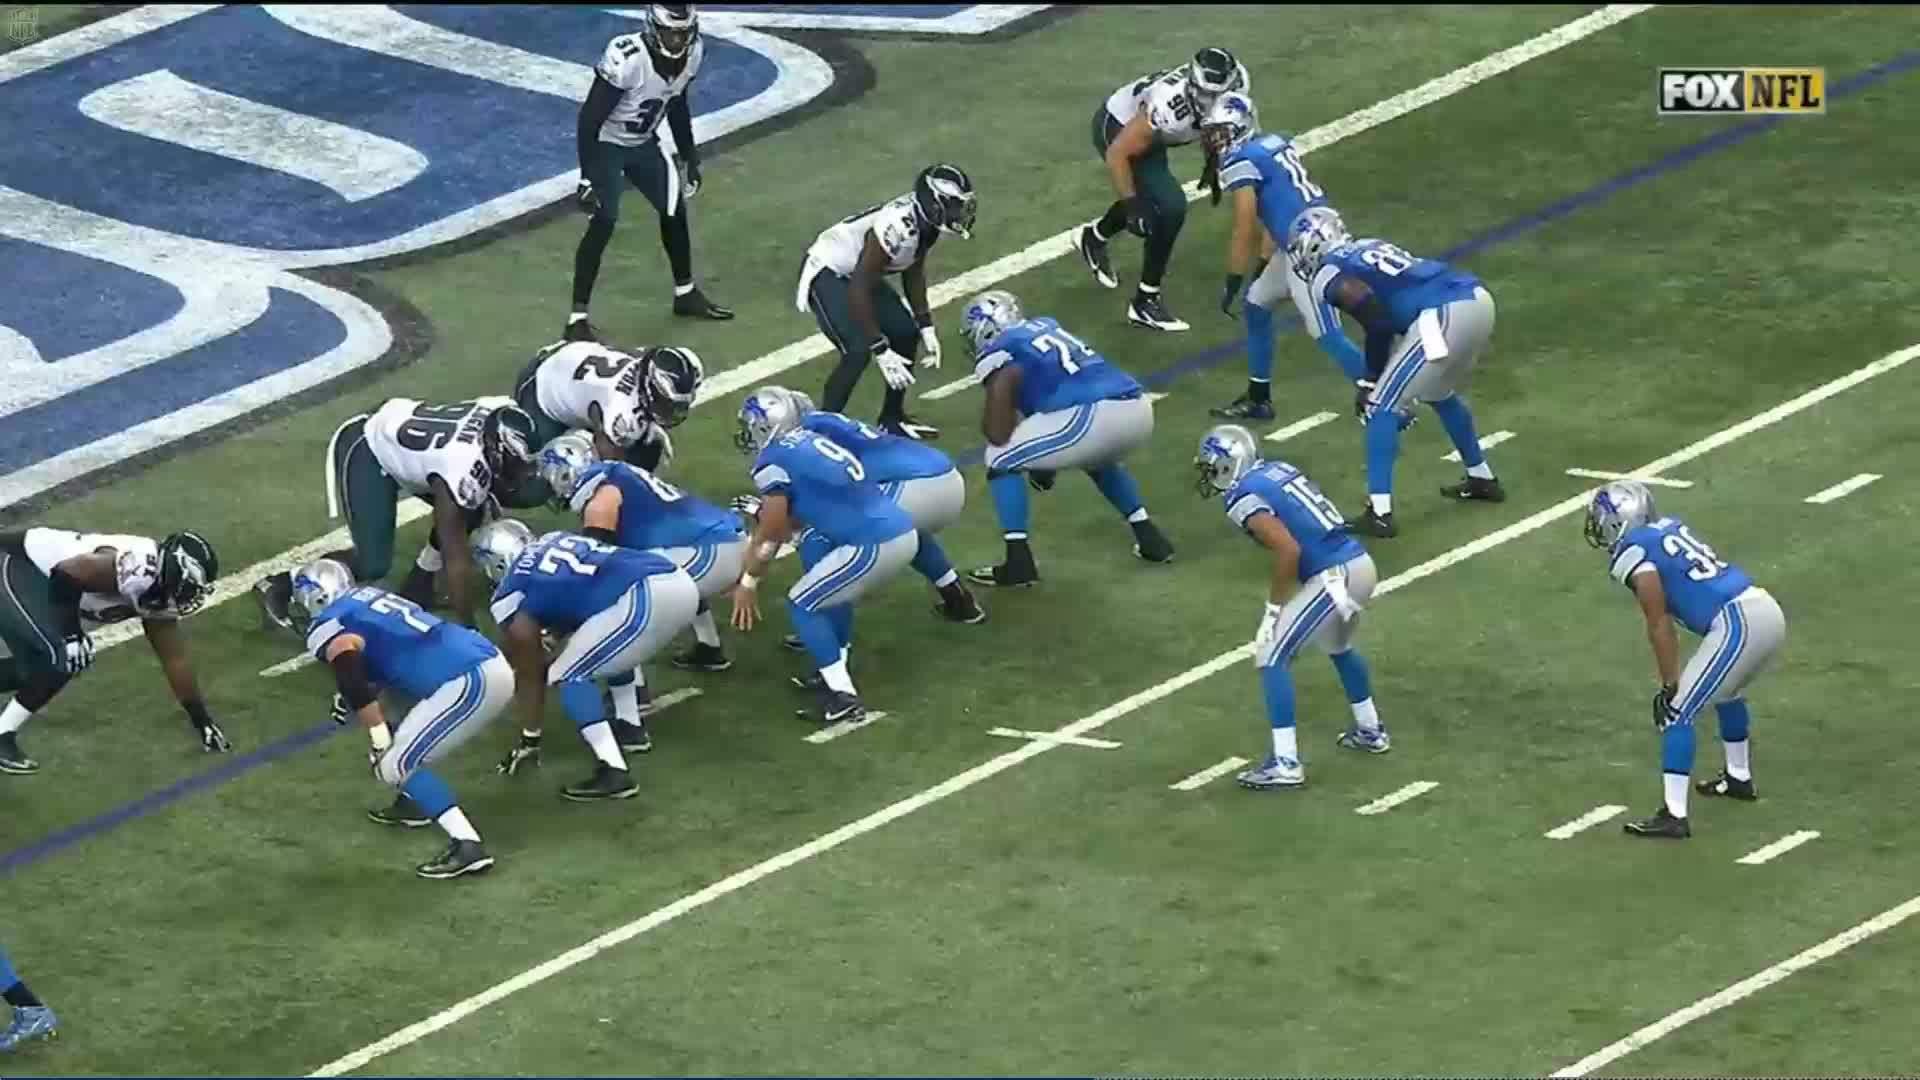 Detroit Lions, detroitlions, Golden Tate walk in Touchdown against Eagles GIFs